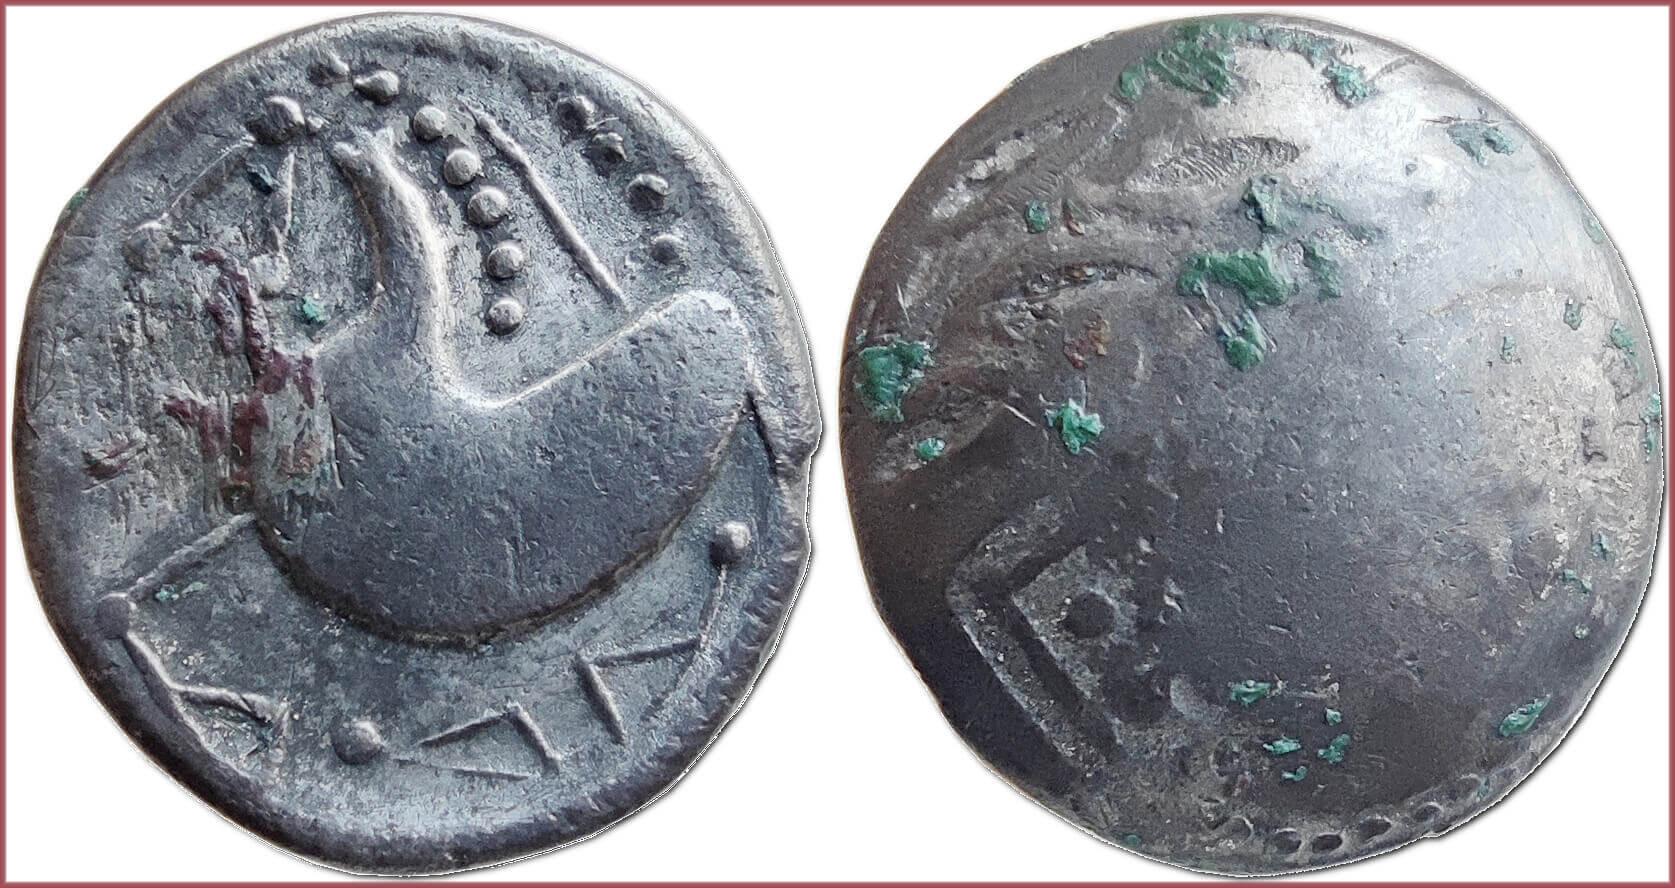 Celtic tetradrachm, 200-100 BC: tribes of celts in Carpathian region